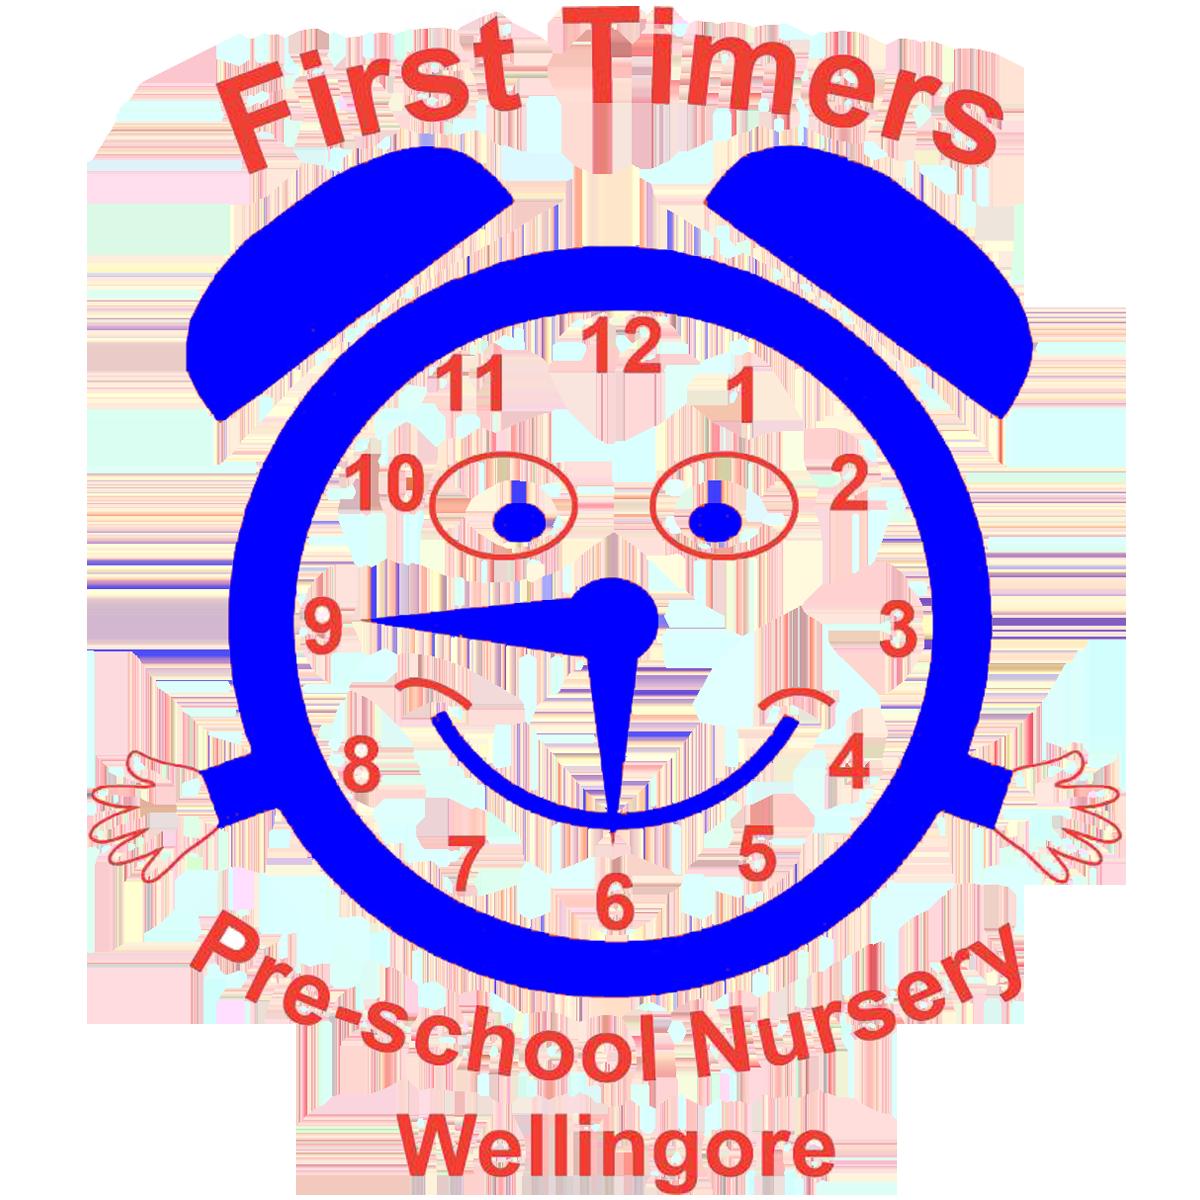 First Timers Pre-School Nursery